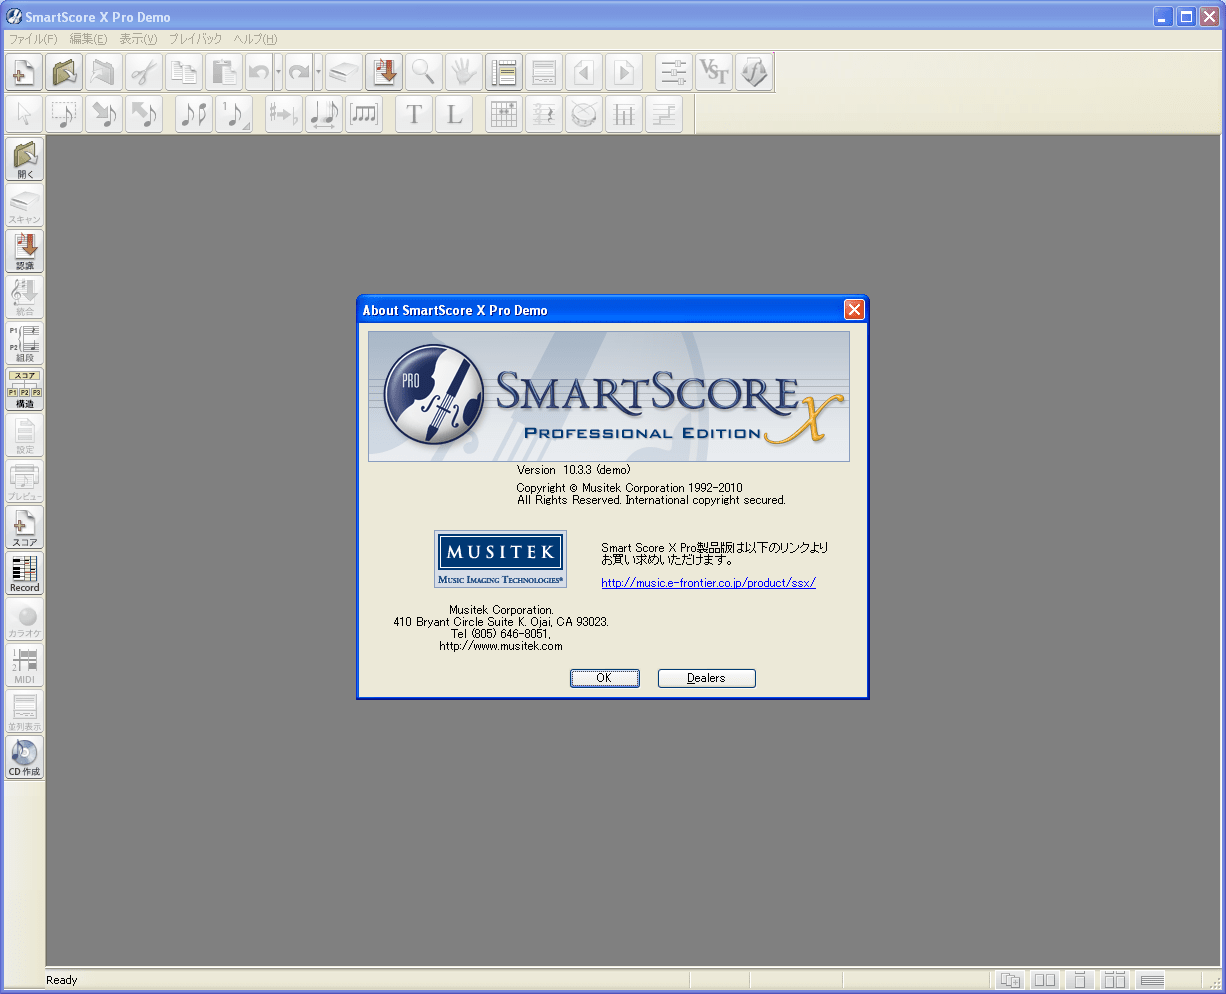 SmartScore X Pro